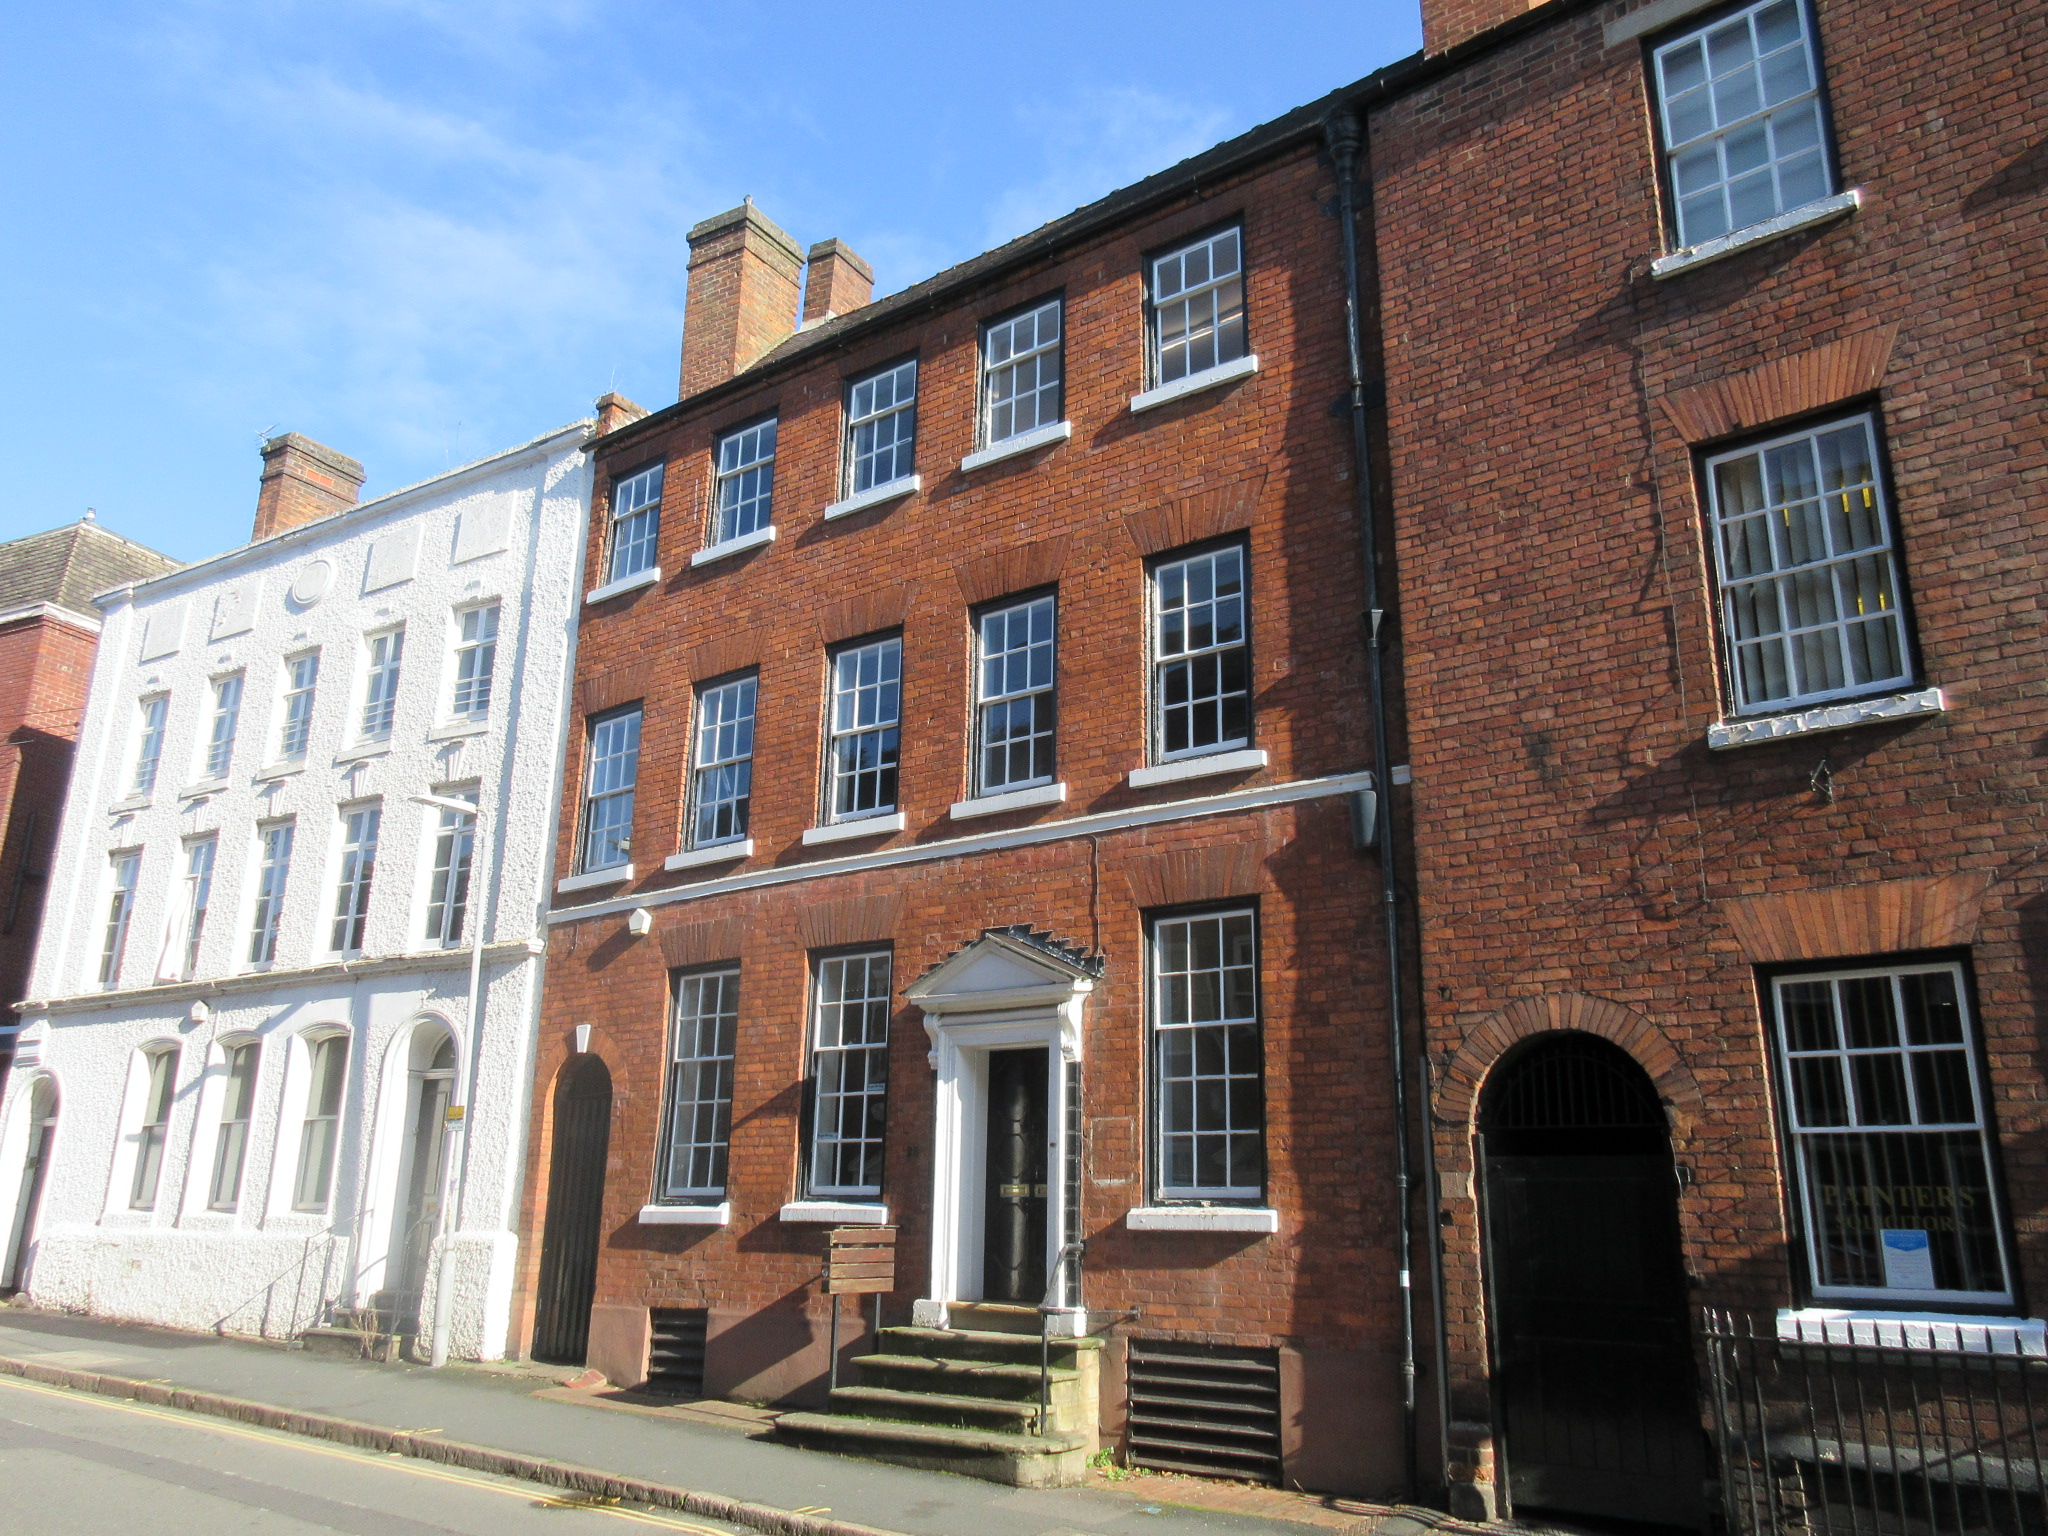 28 Church Street Kidderminster - Click for more details